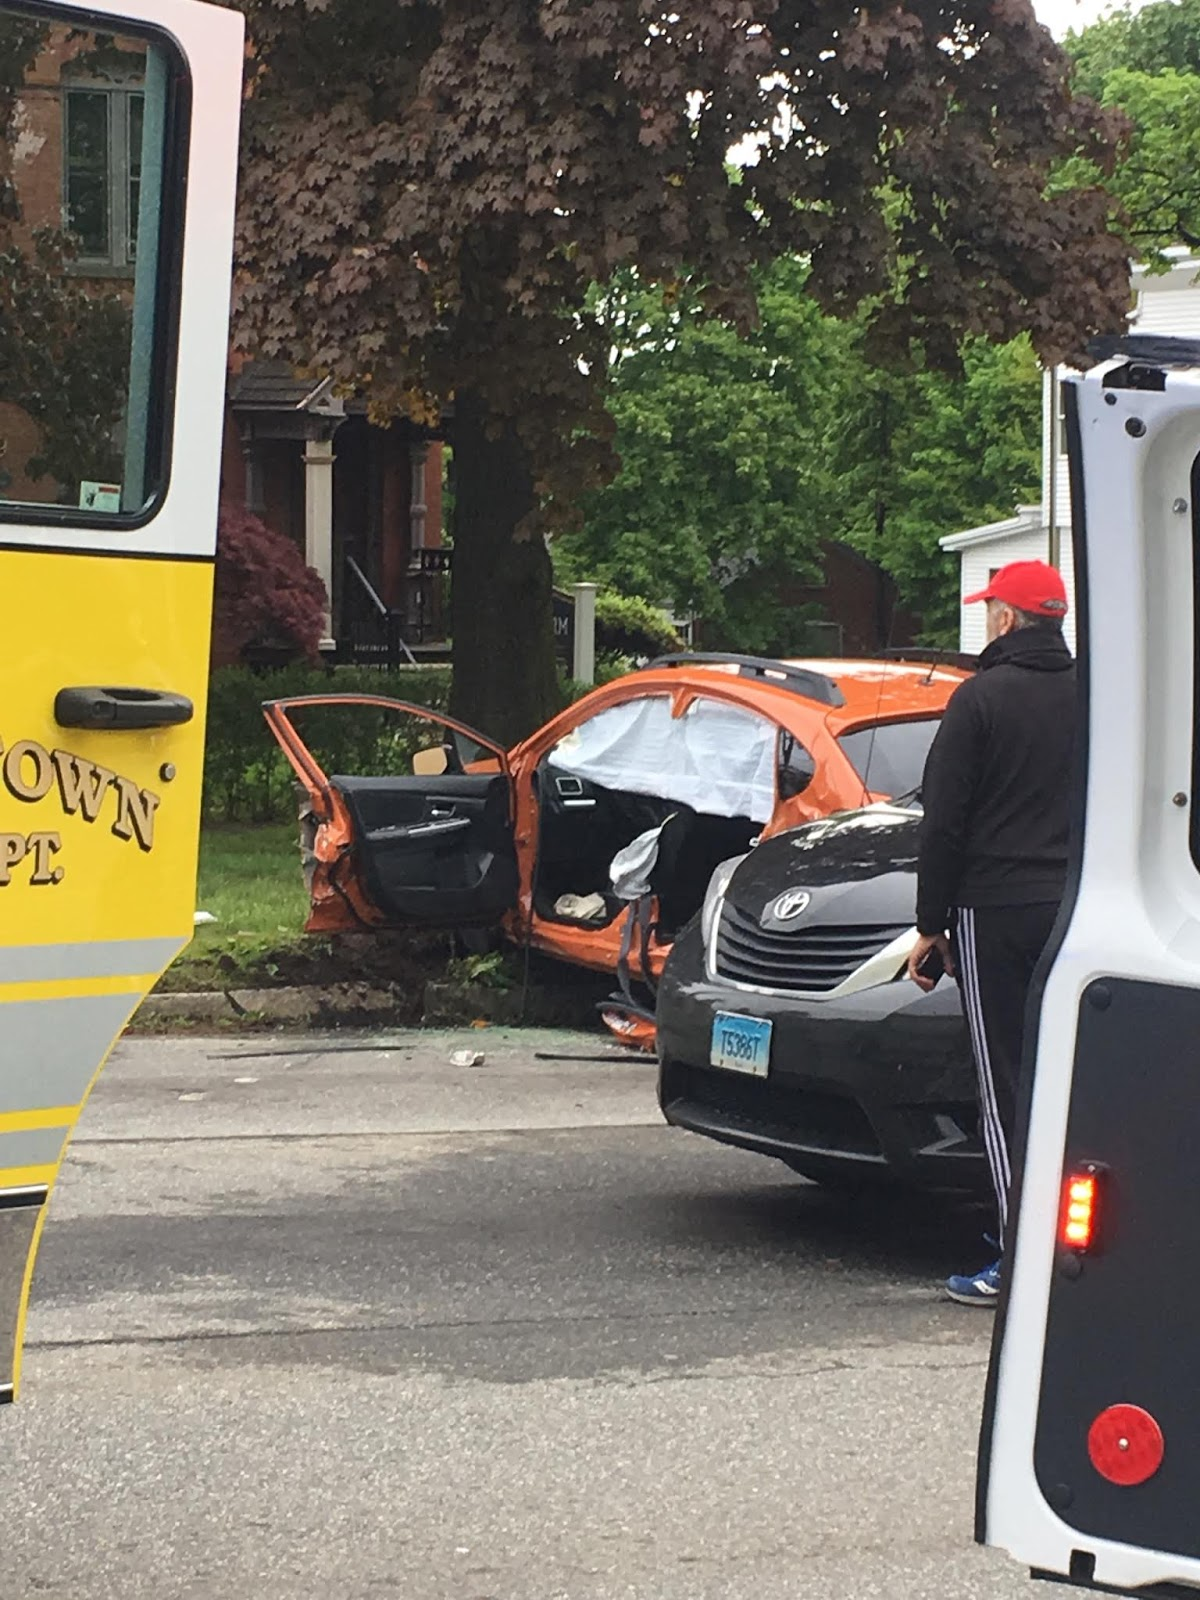 middletowneye: Firetruck accident closes Washington Street